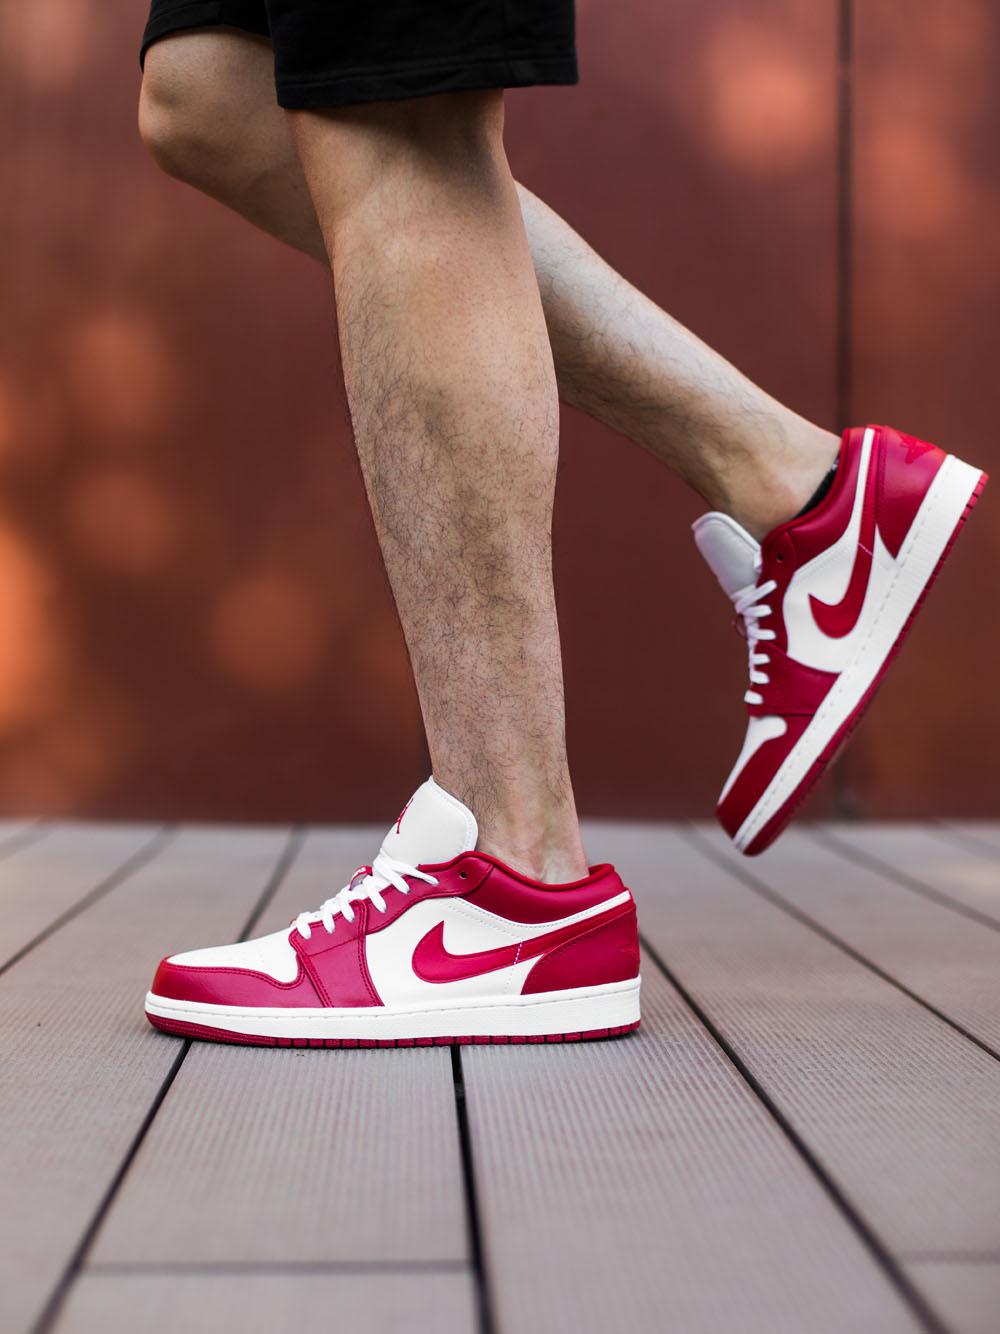 553558-611,AJ1,AJ4,CT8527-112 553558-611 近期新鞋!这两双白红 AJ 都是值得关注的宝藏!